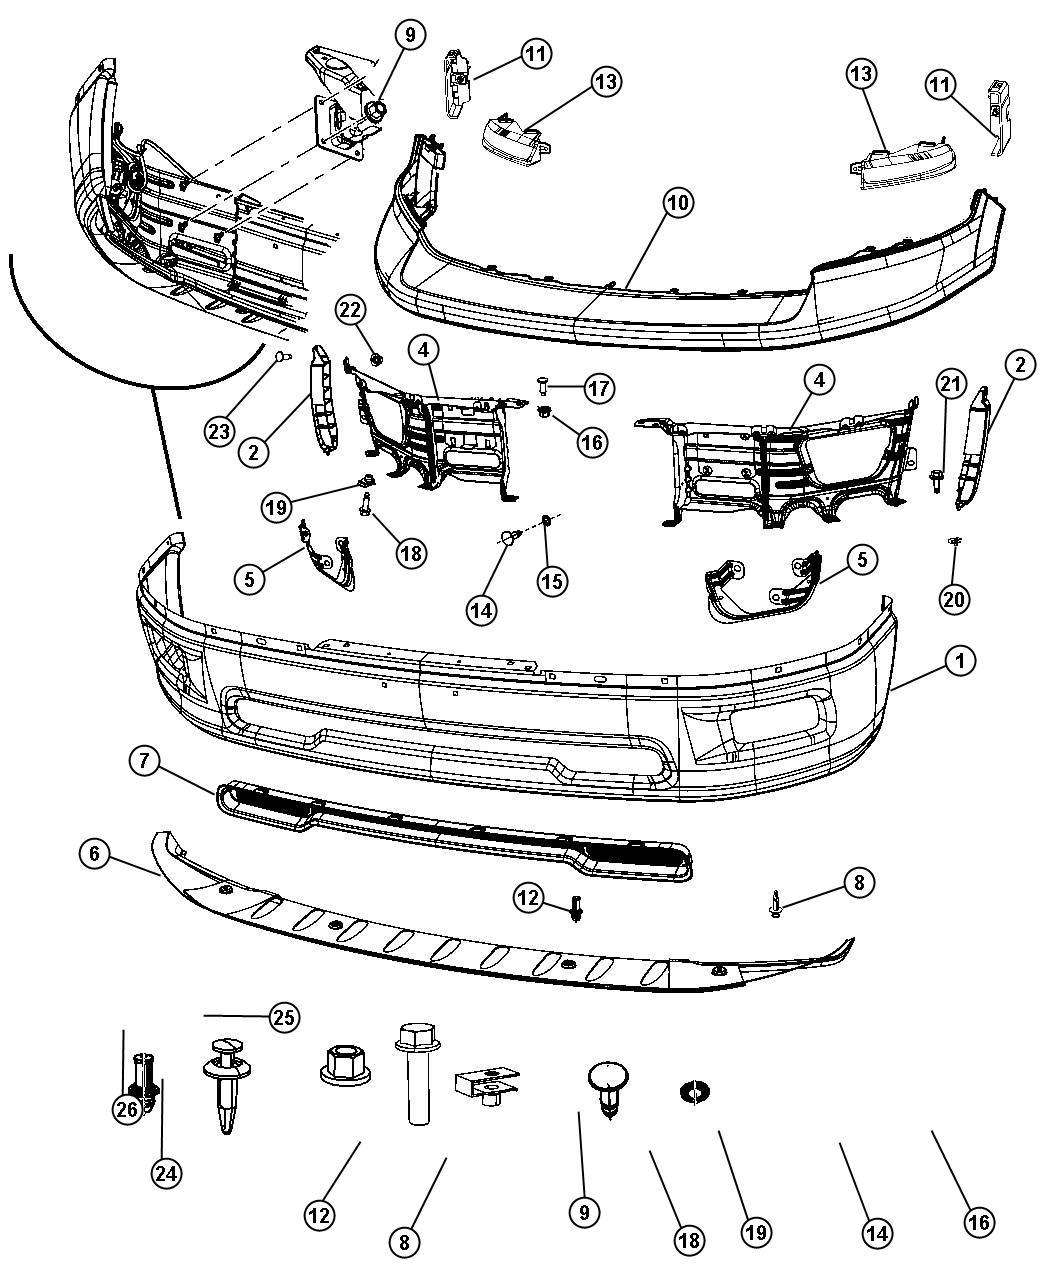 Ram Push Pin Side Bracket Attaching Front Bumper